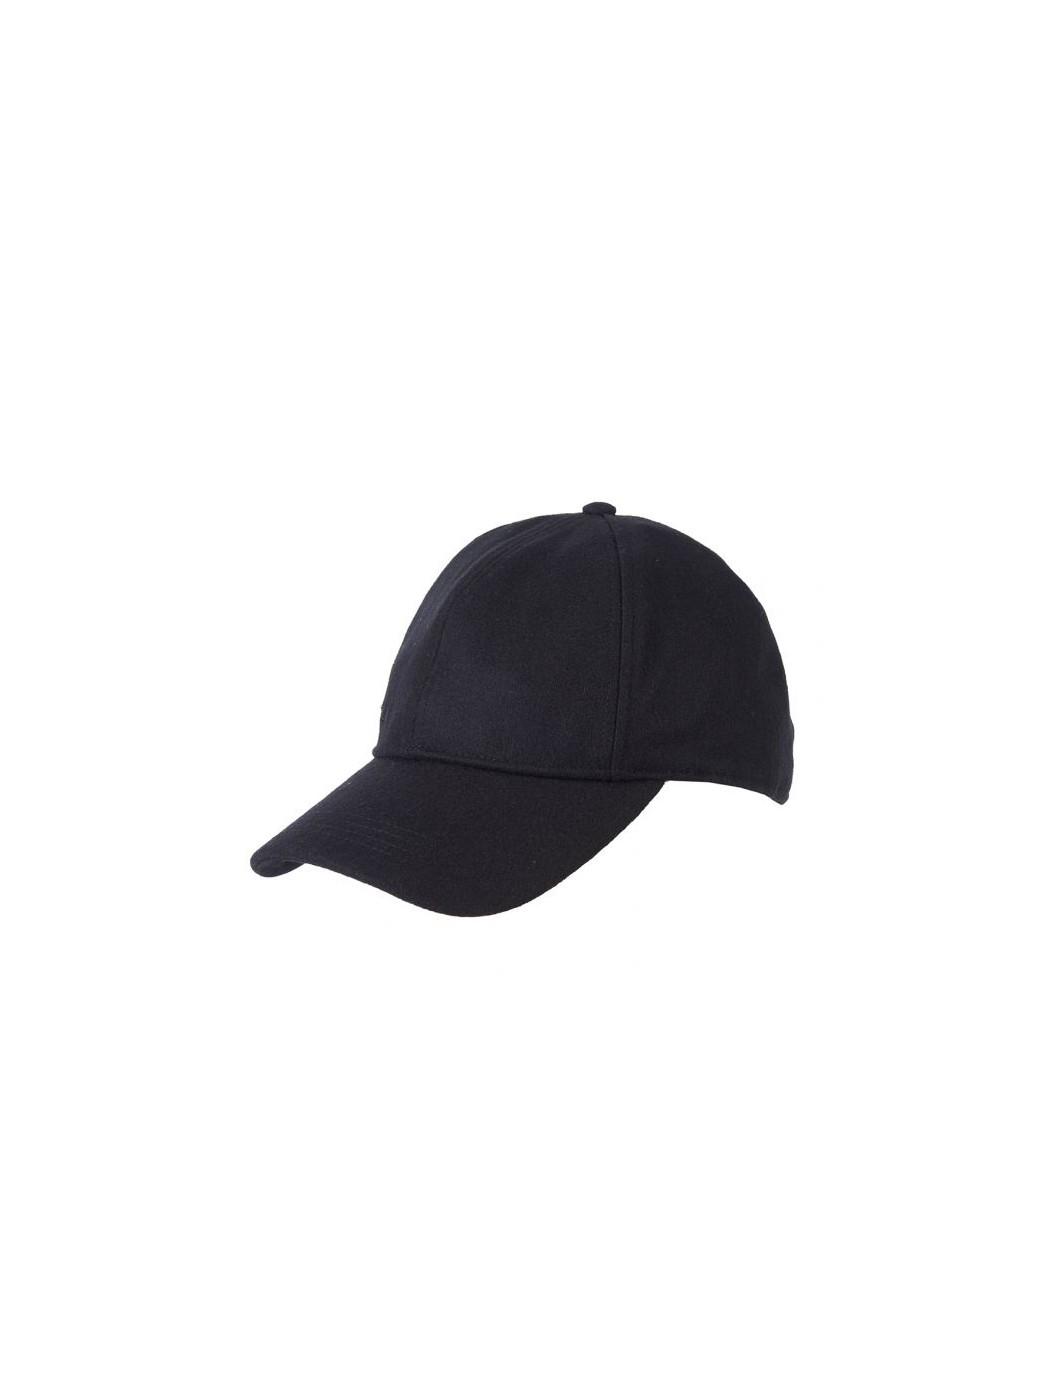 COOPWORTH SPORT CAP BARBOUR MHA0444 BK31